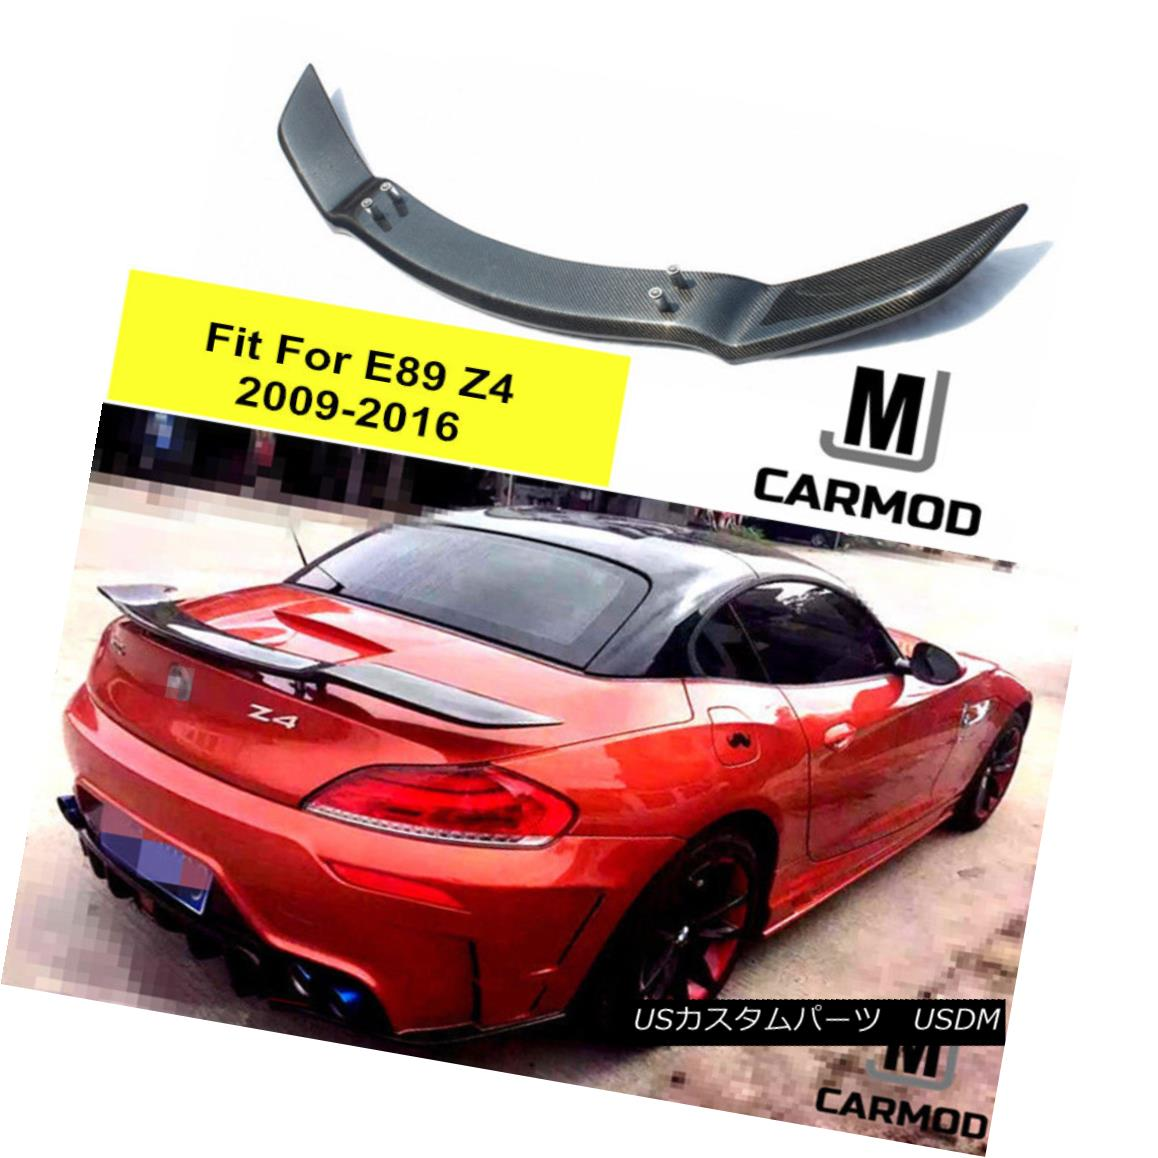 TOMMY 2009-2016 Z4 STYLE BMW ROWEN REAR E89 KAIRA エアロパーツ SPOILER 2009-2016 STYLE CARBON FOR FIBERリヤスポイラ TOMMY FIBER BMW Z4 ROWEN FIT CARBON E89 KAIRA